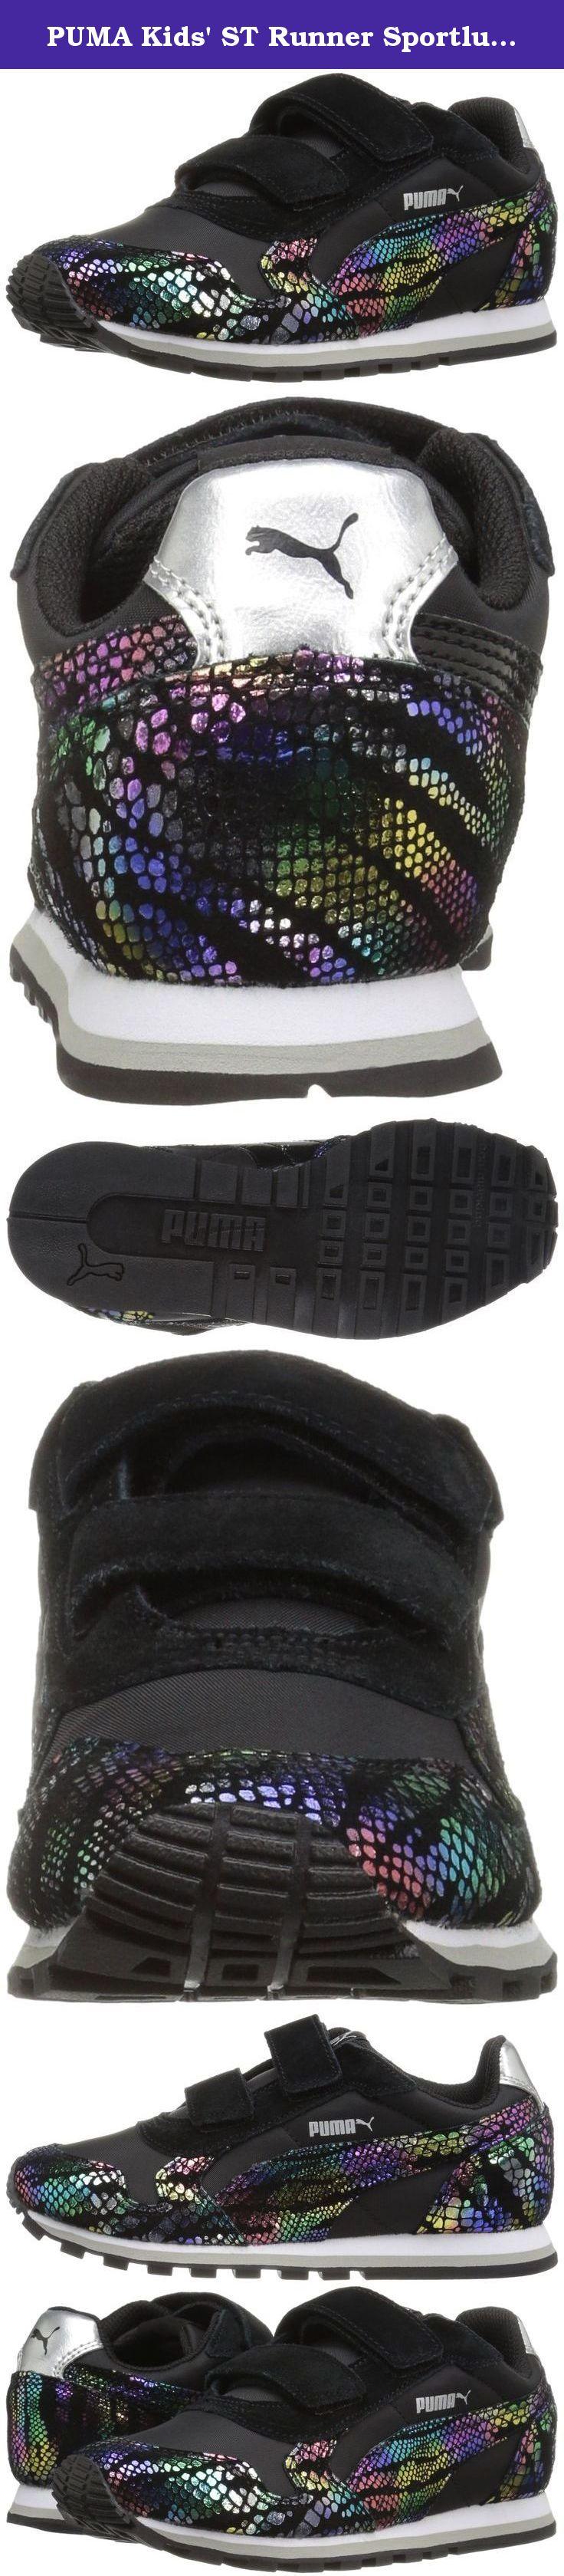 44373b98afd8 PUMA Kids  ST Runner Sportlux V PS Sneaker